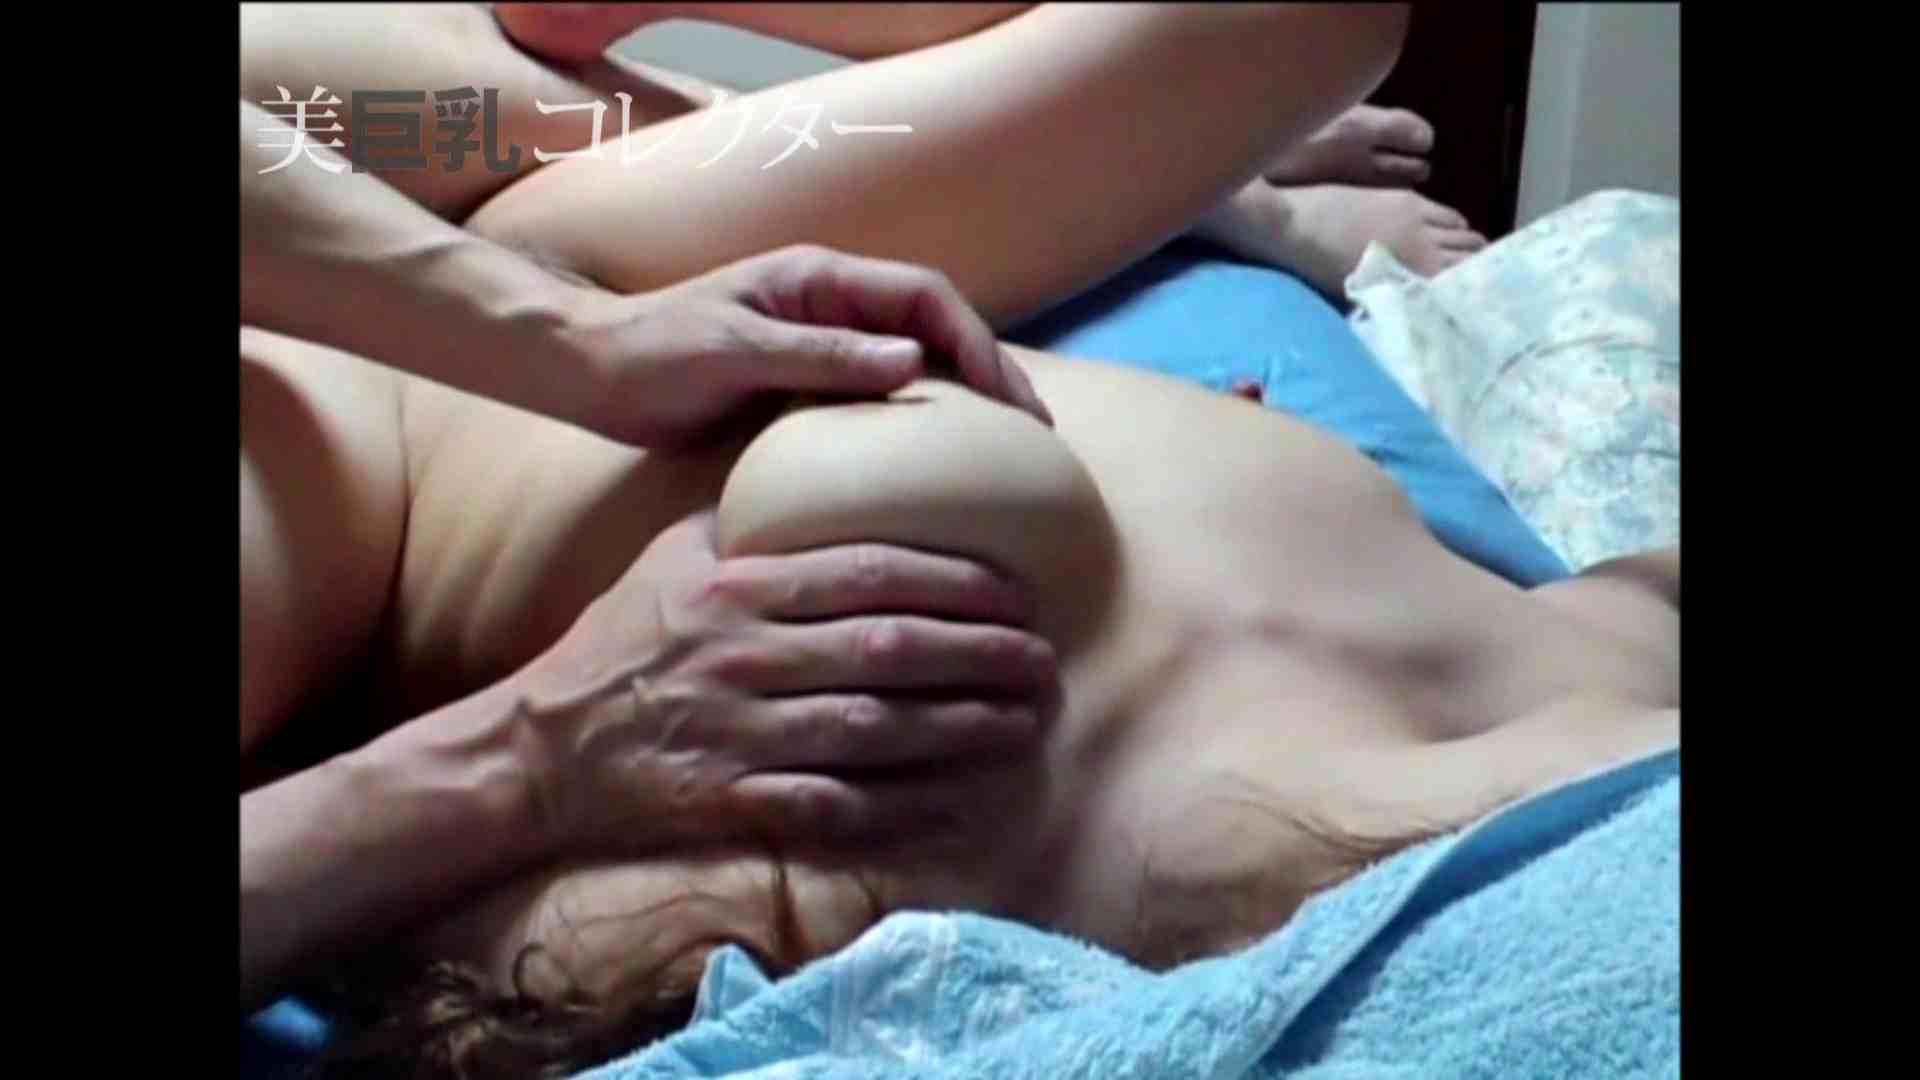 泥酔スレンダー巨乳美女2 巨乳女子 盗撮動画紹介 109pic 23